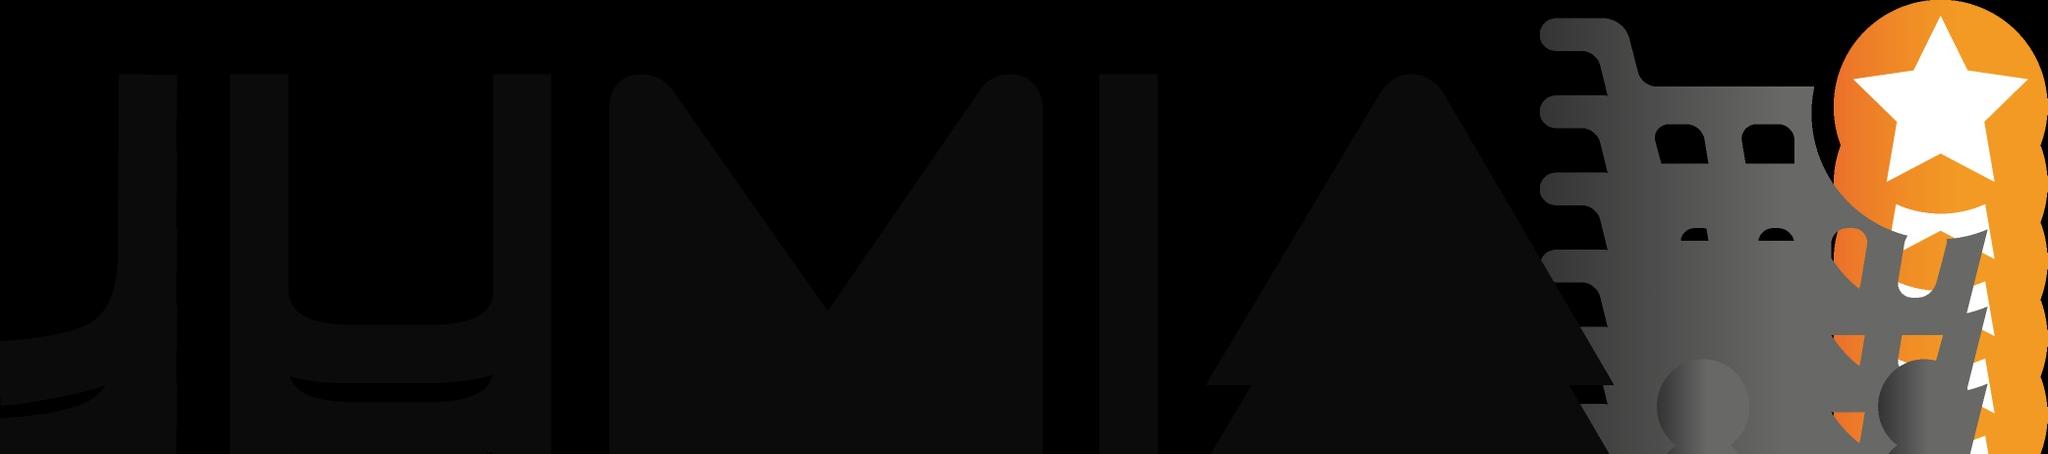 1547219639-jumia-logo-noir.png